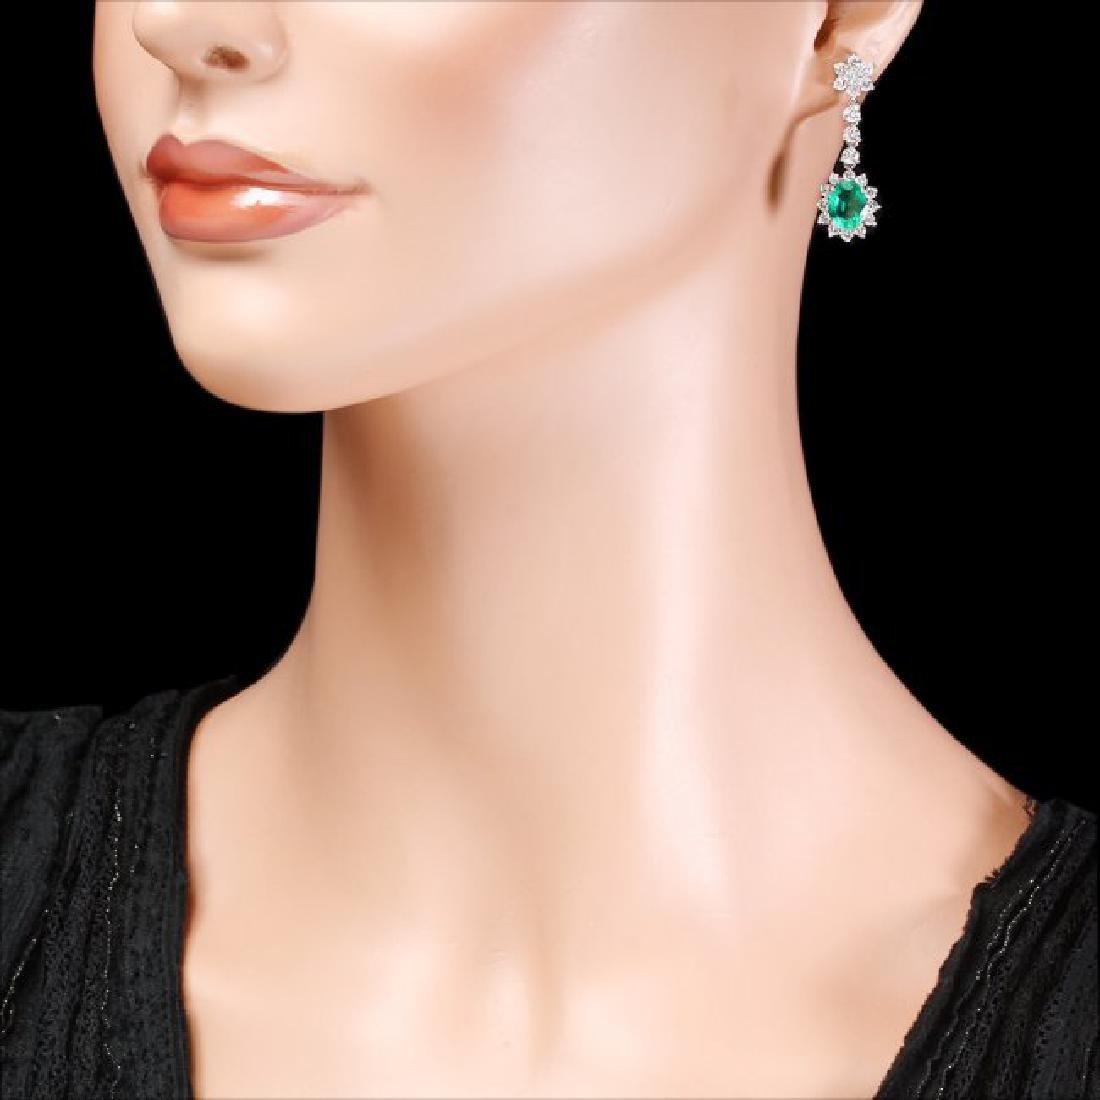 14k W Gold 3.50ct Emerald 2.50ct Diamond Earrings - 4